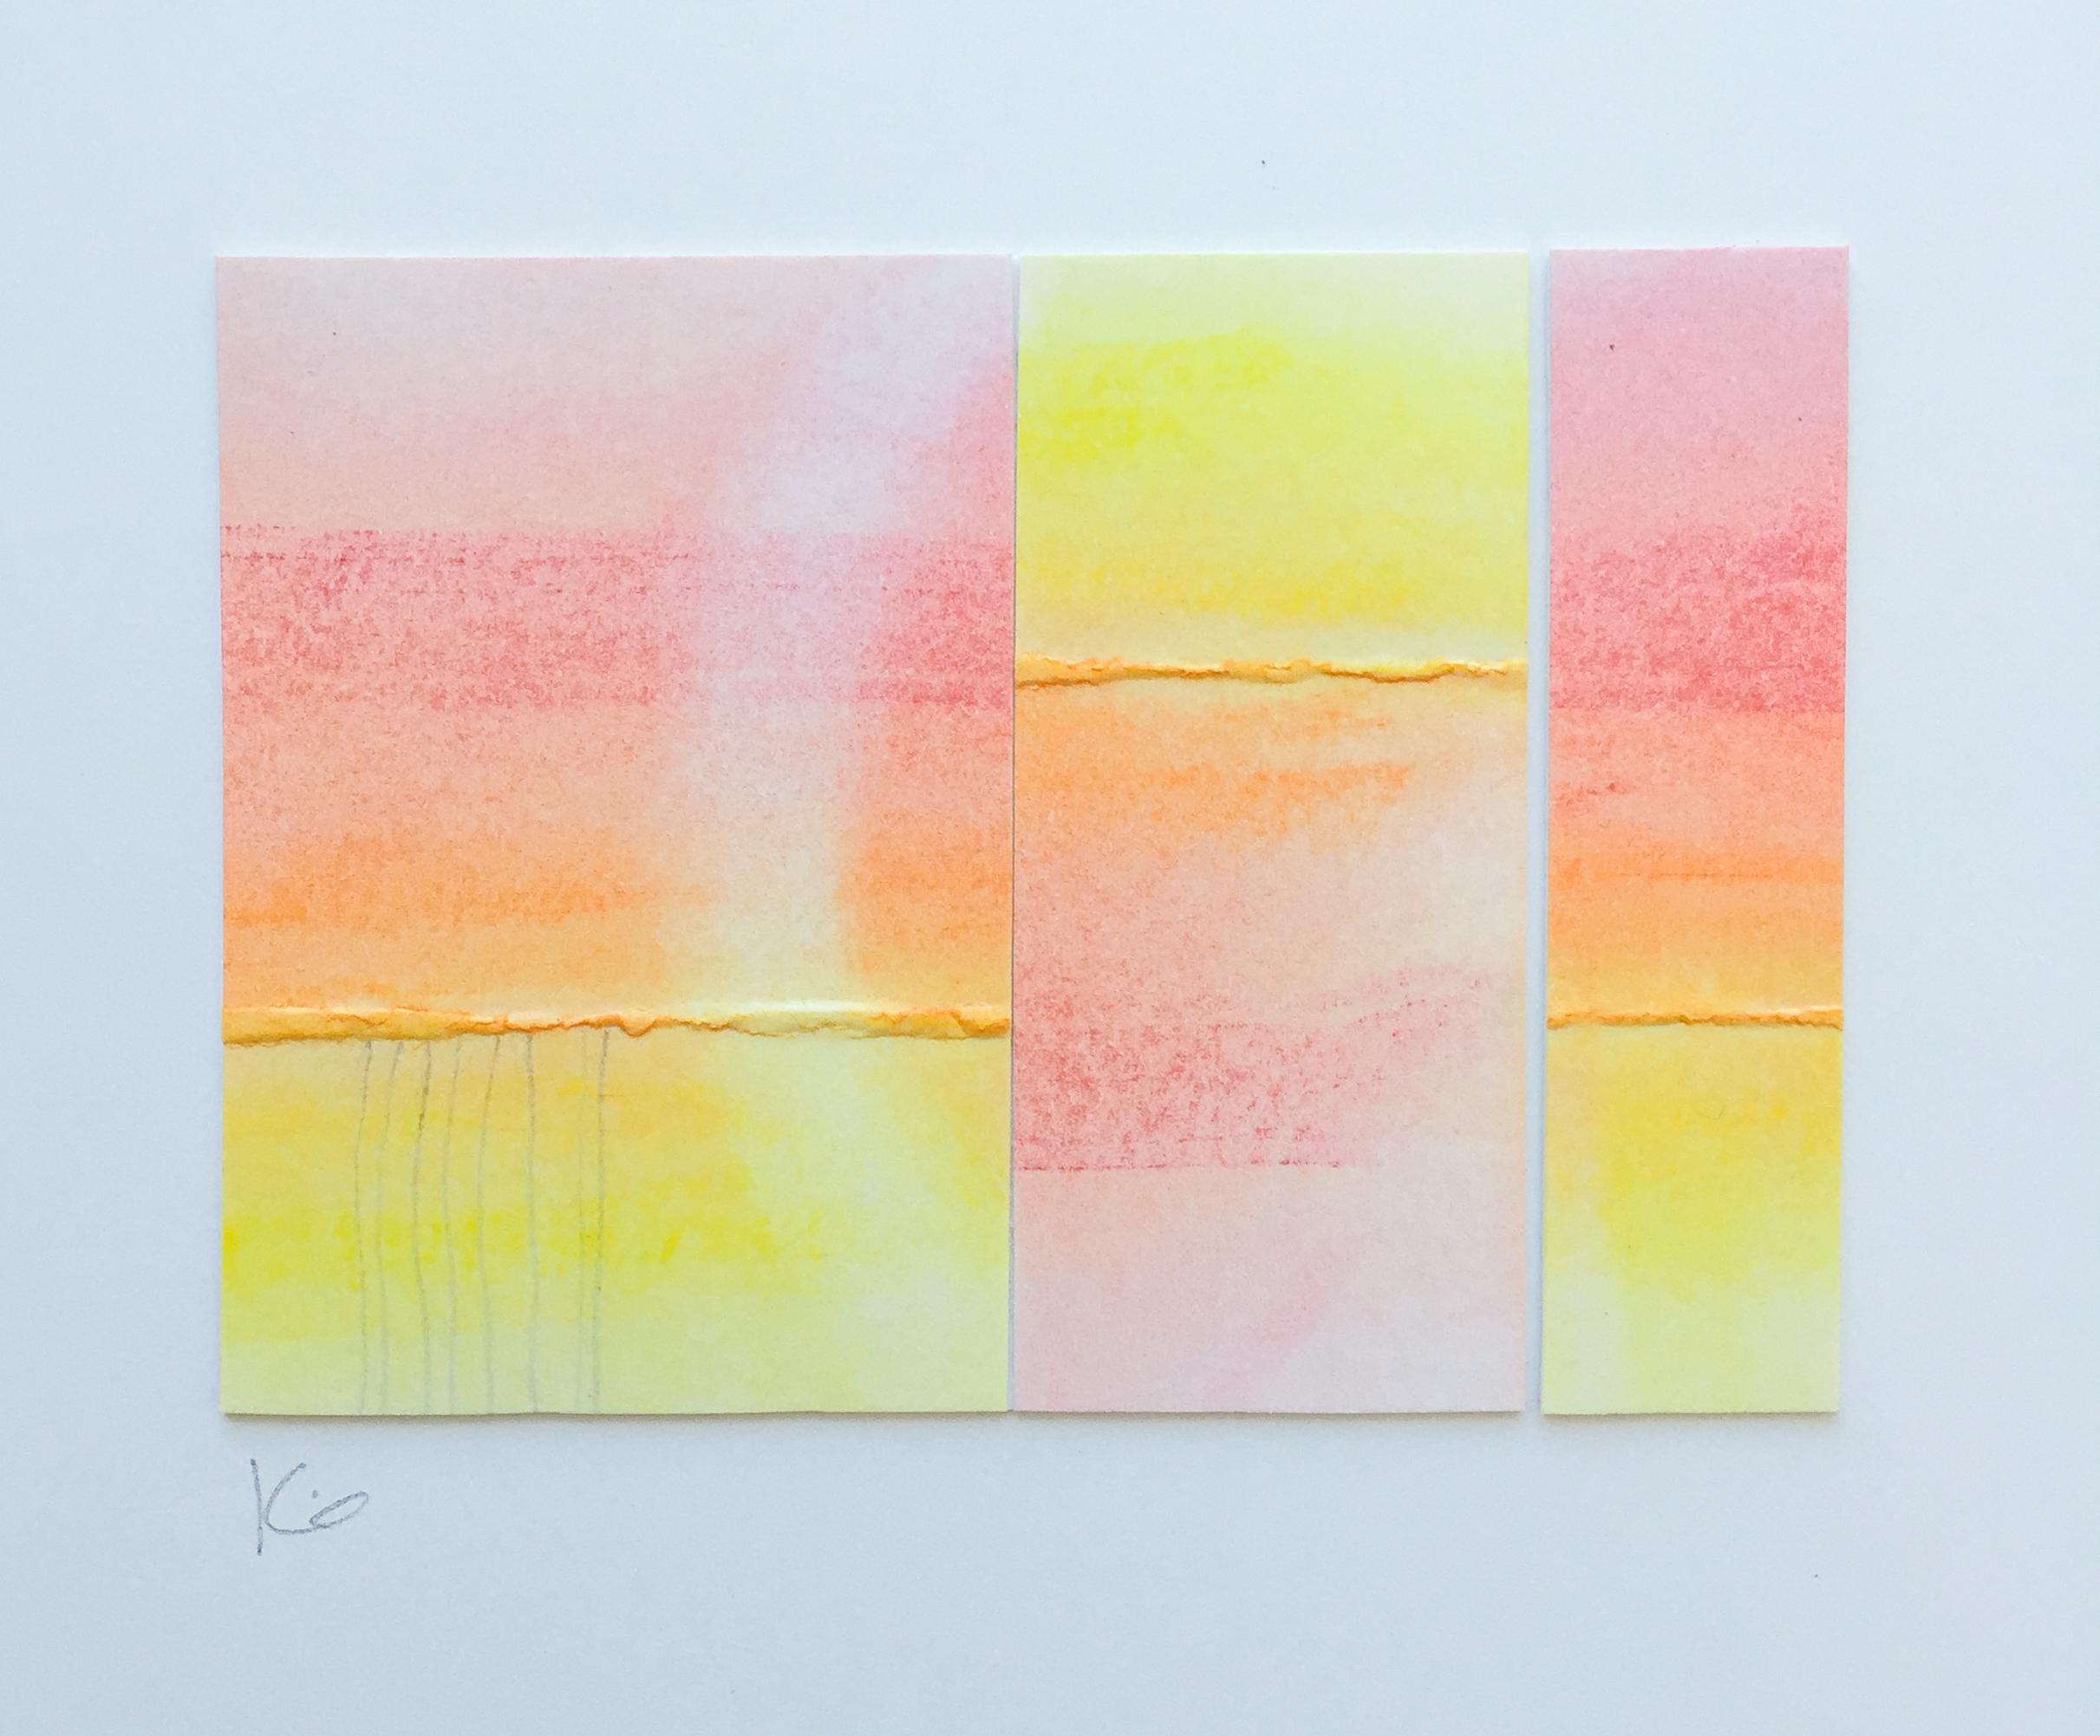 Sunset.  Collaged folded bristol, pastels, pencil. 3.25 x 2.25 inches on 9 x 12 inch bristol. 2016. Karen Anne Glick